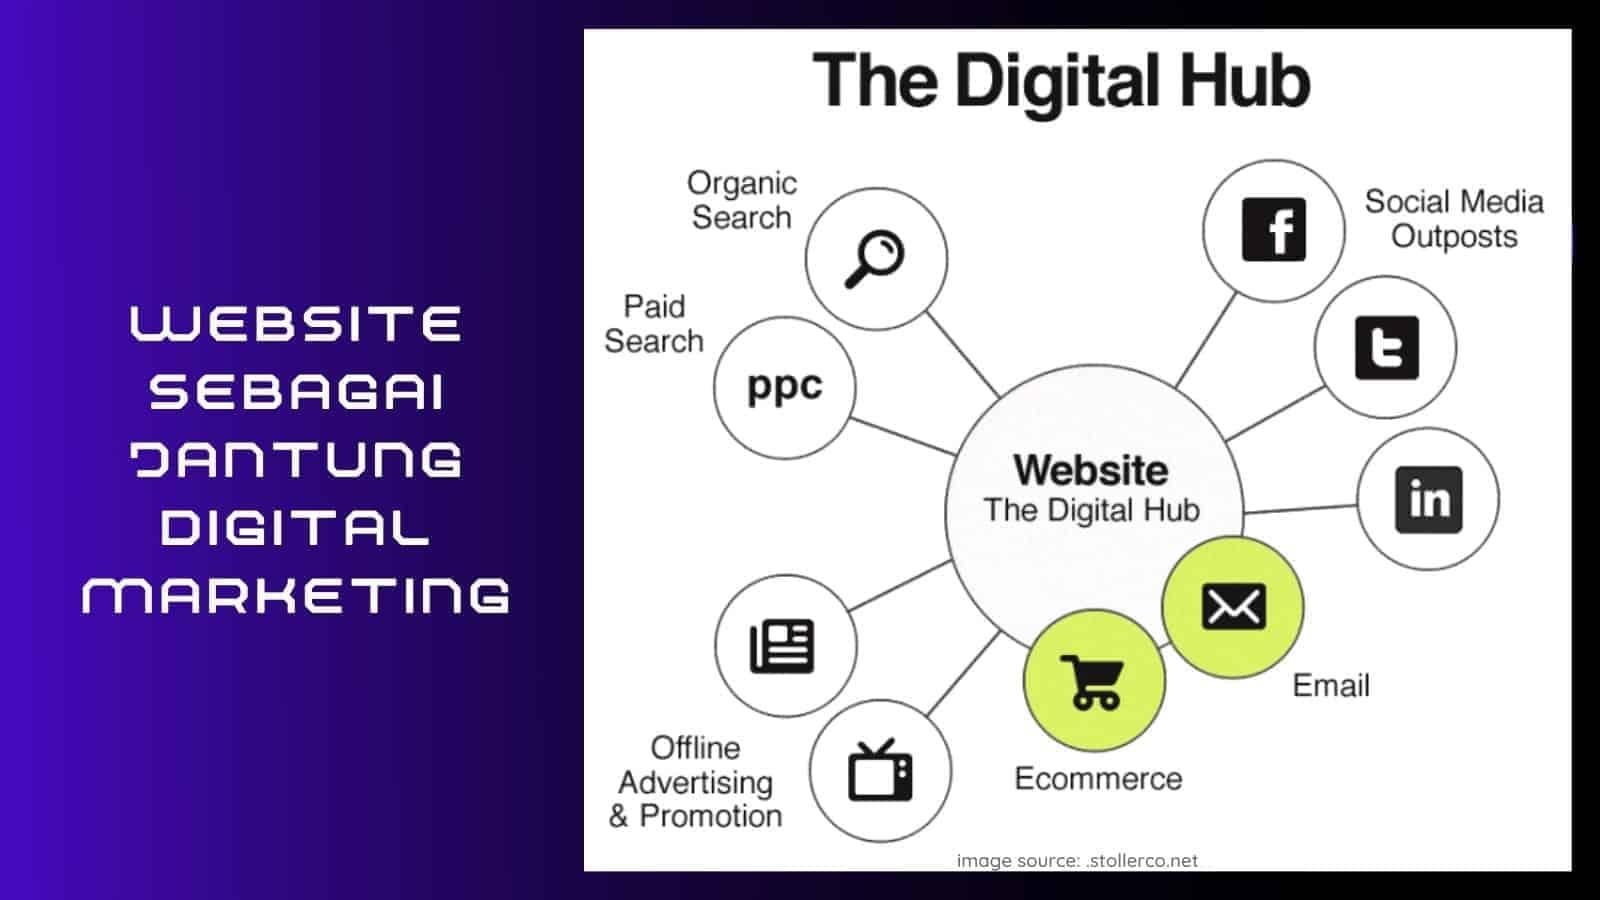 website sebagai jantung digital marketing